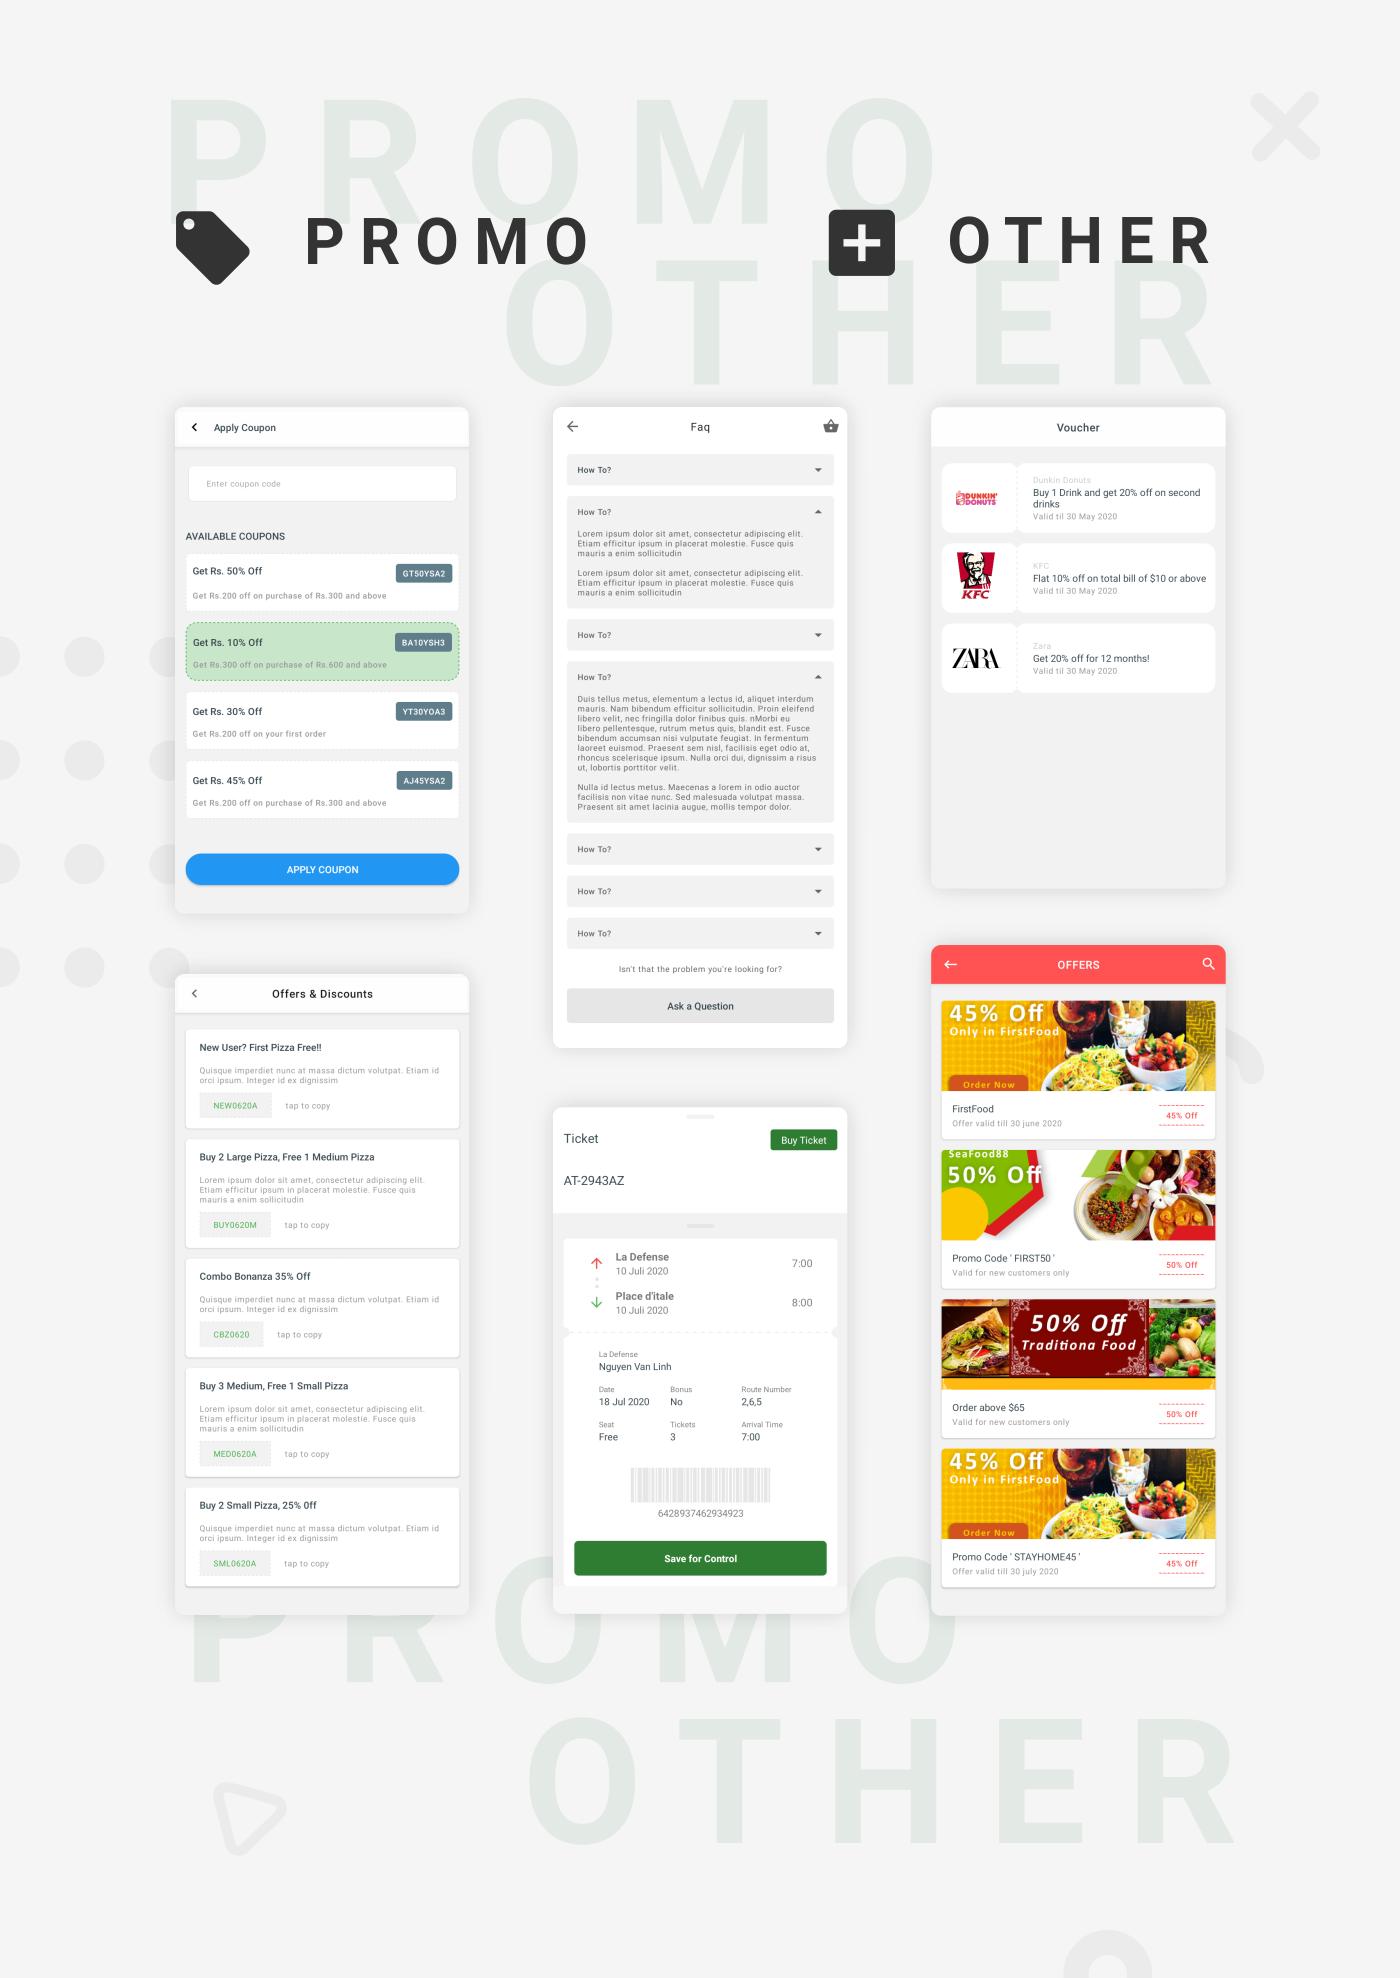 EcommerceX - Premium Ecommerce App UI Kit Template 1.0 - 9